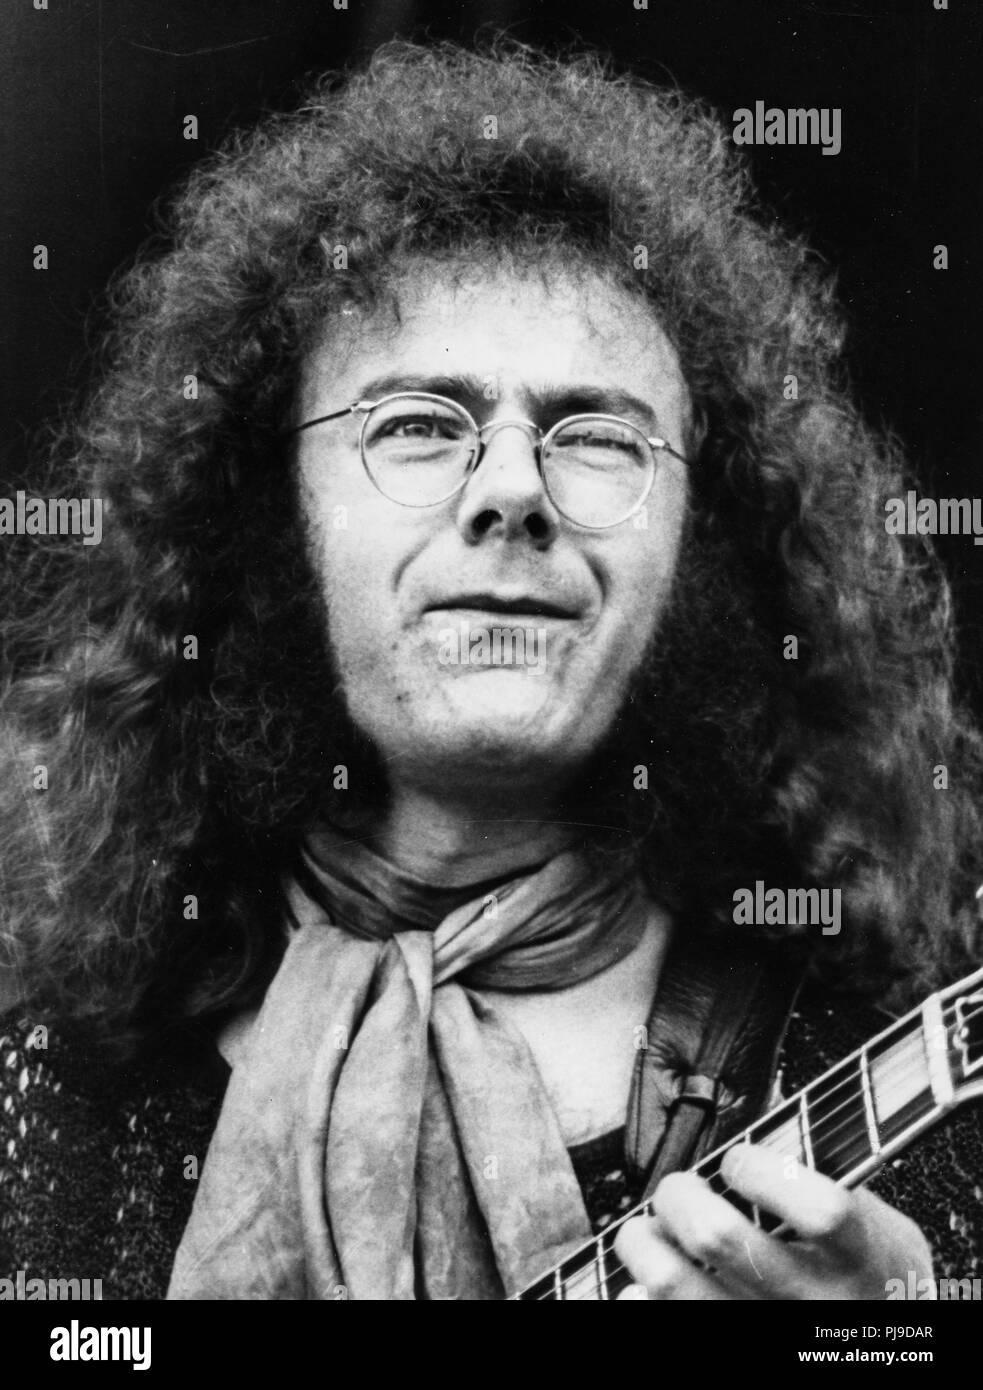 Robert Fripp, King Crimson, 70 Photo Stock